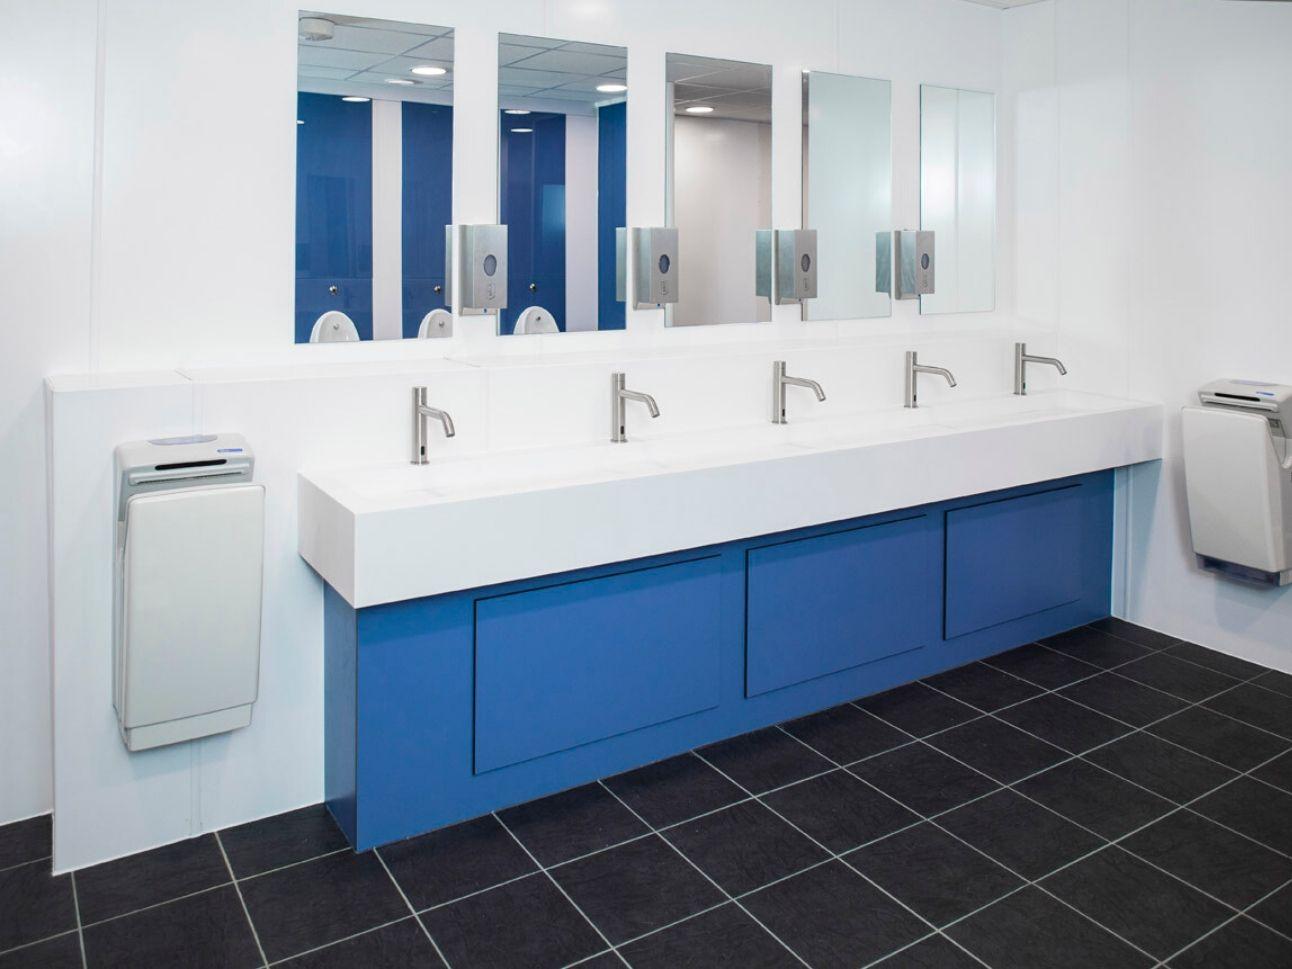 Ernest Bevin College Toilet Refurbishment | Commercial Washrooms